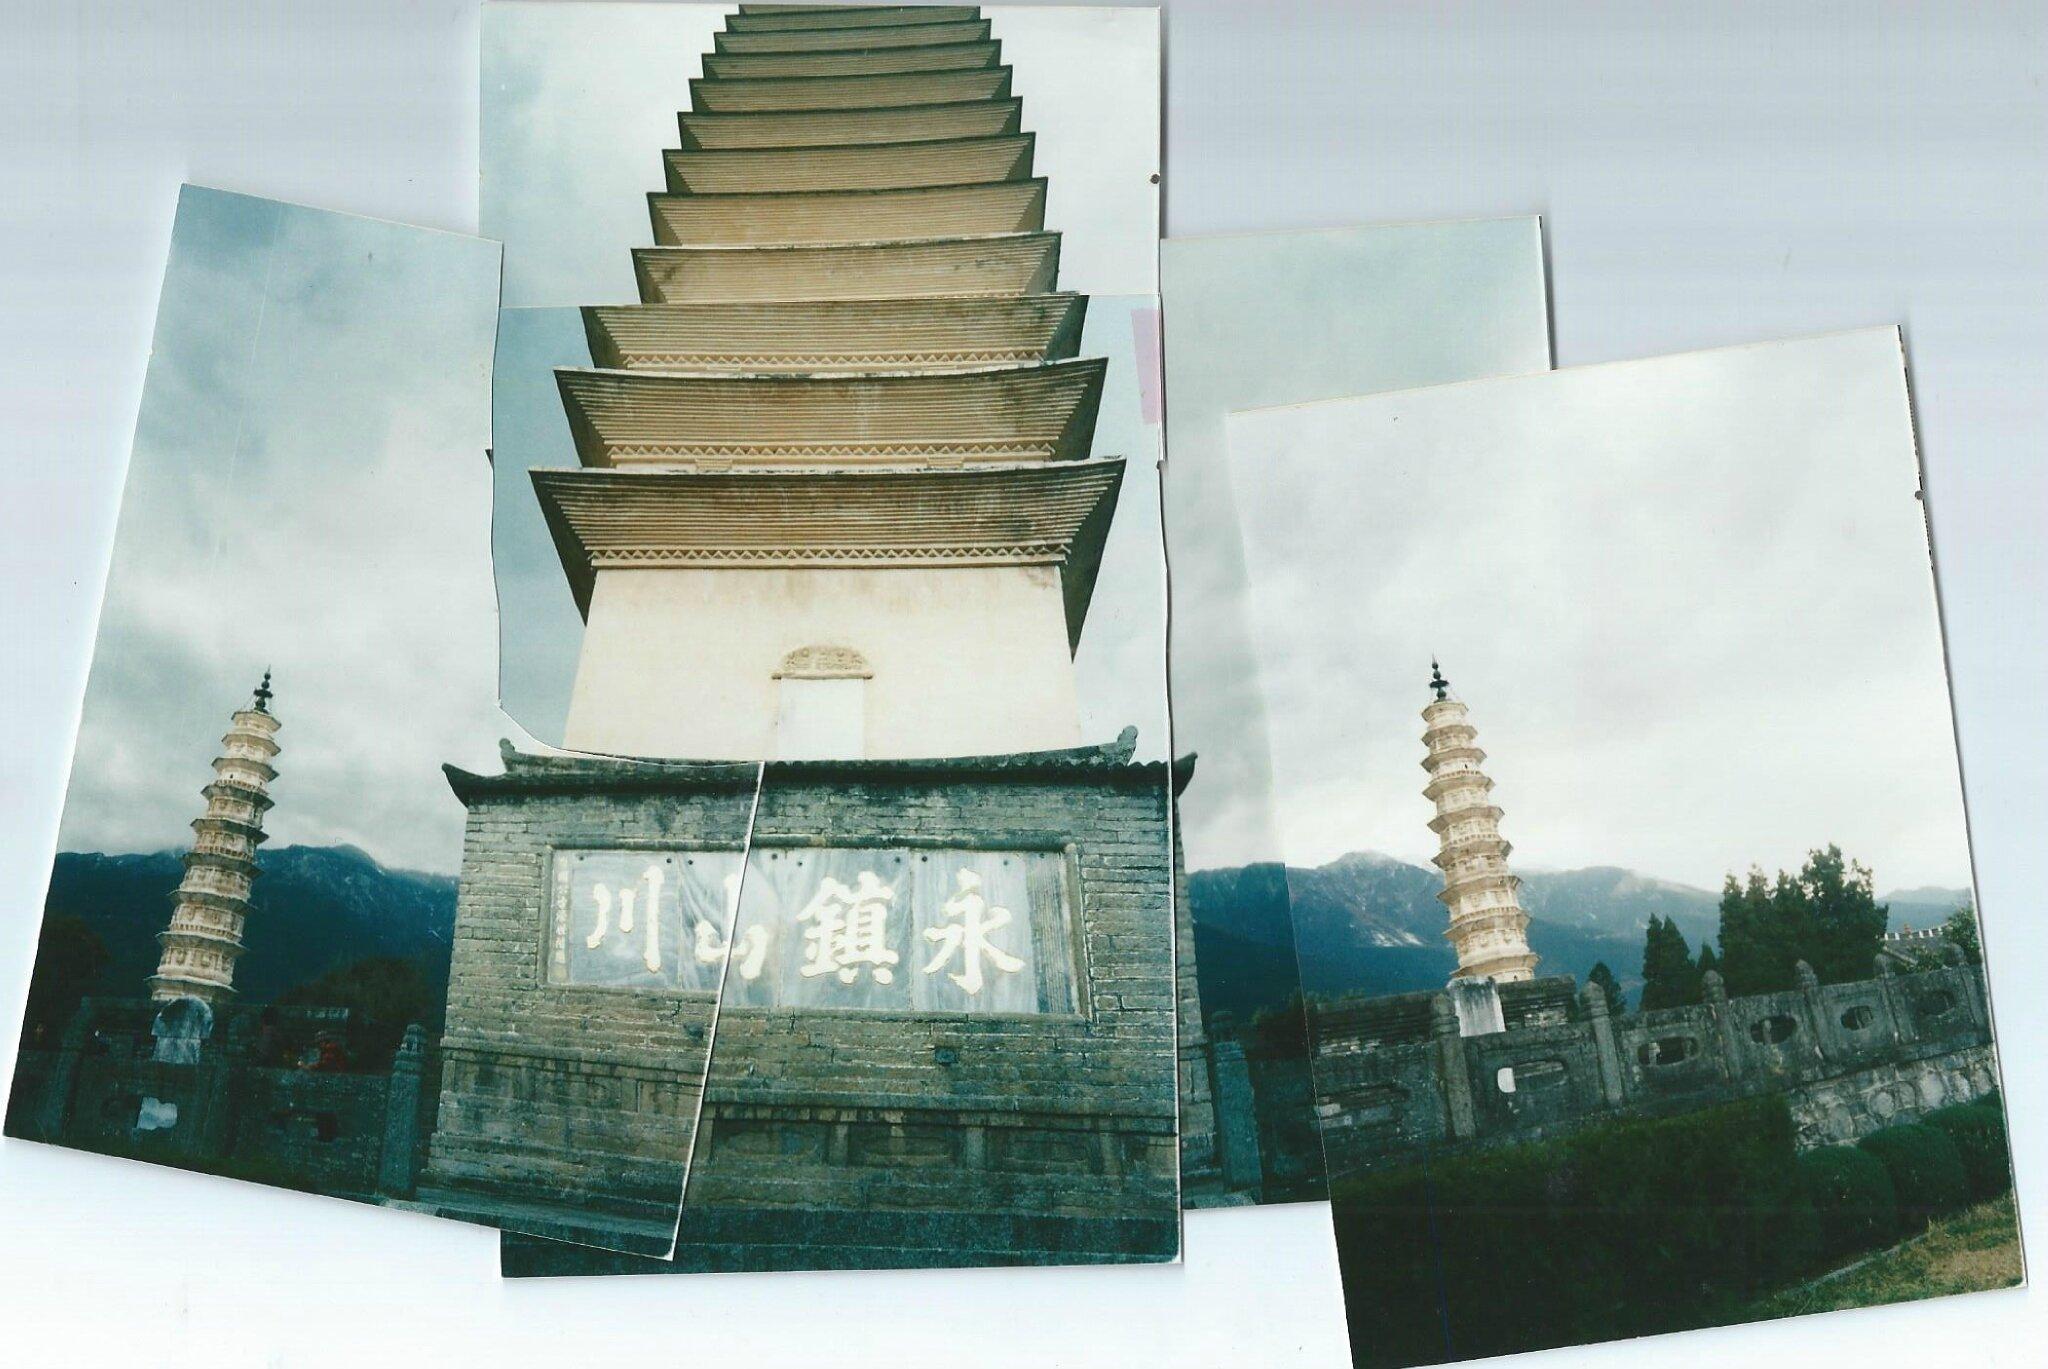 Panoramiques du Yunnan, chunjie (nouvel an chinois) 2004